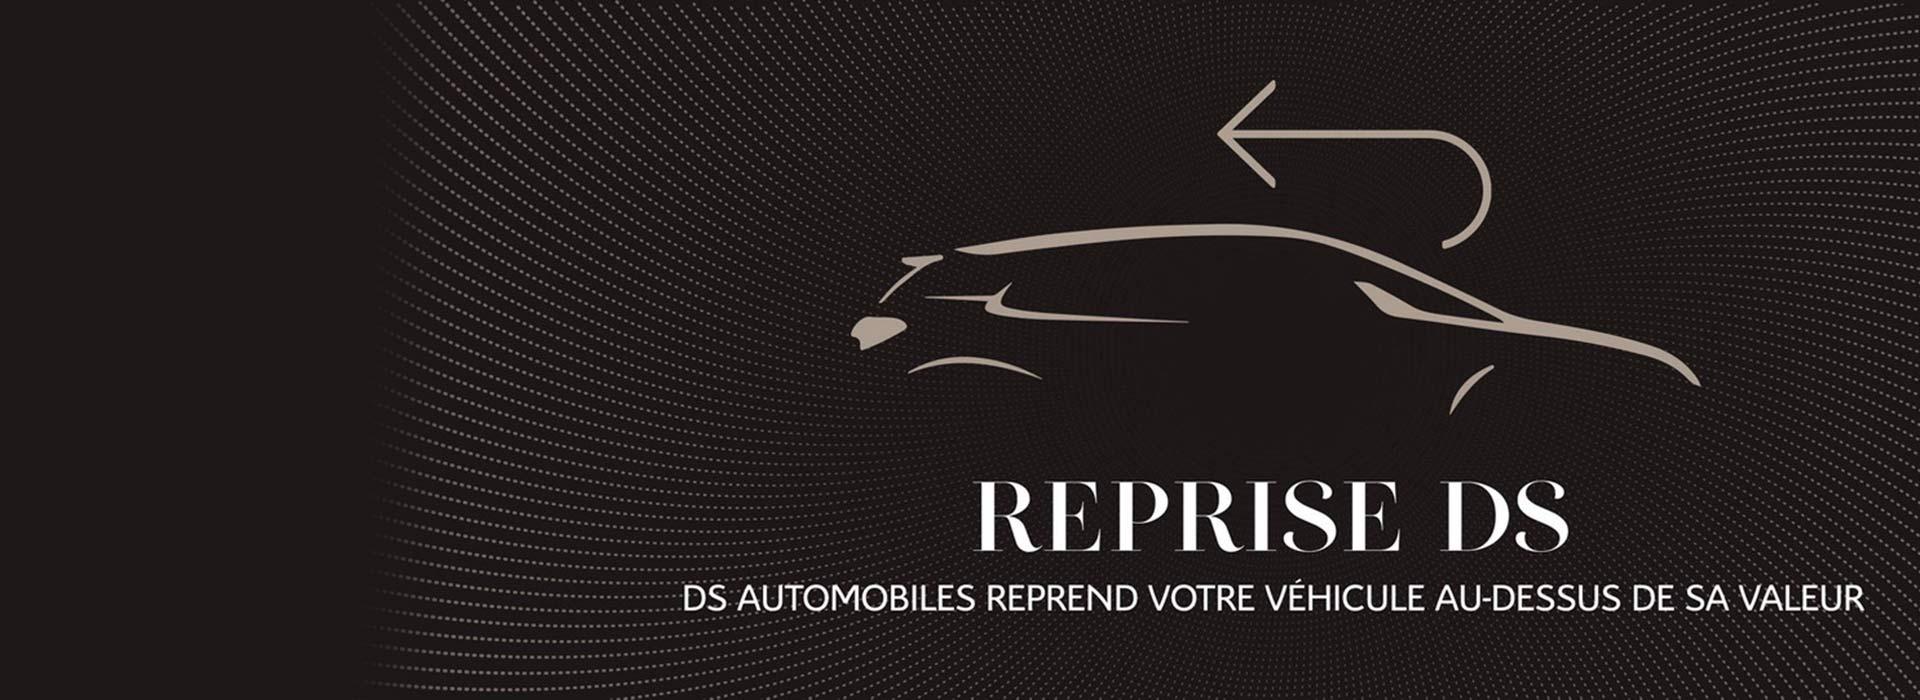 groupe lamirault concessionnaire automobile multimarques renault audi toyota volkswagen. Black Bedroom Furniture Sets. Home Design Ideas